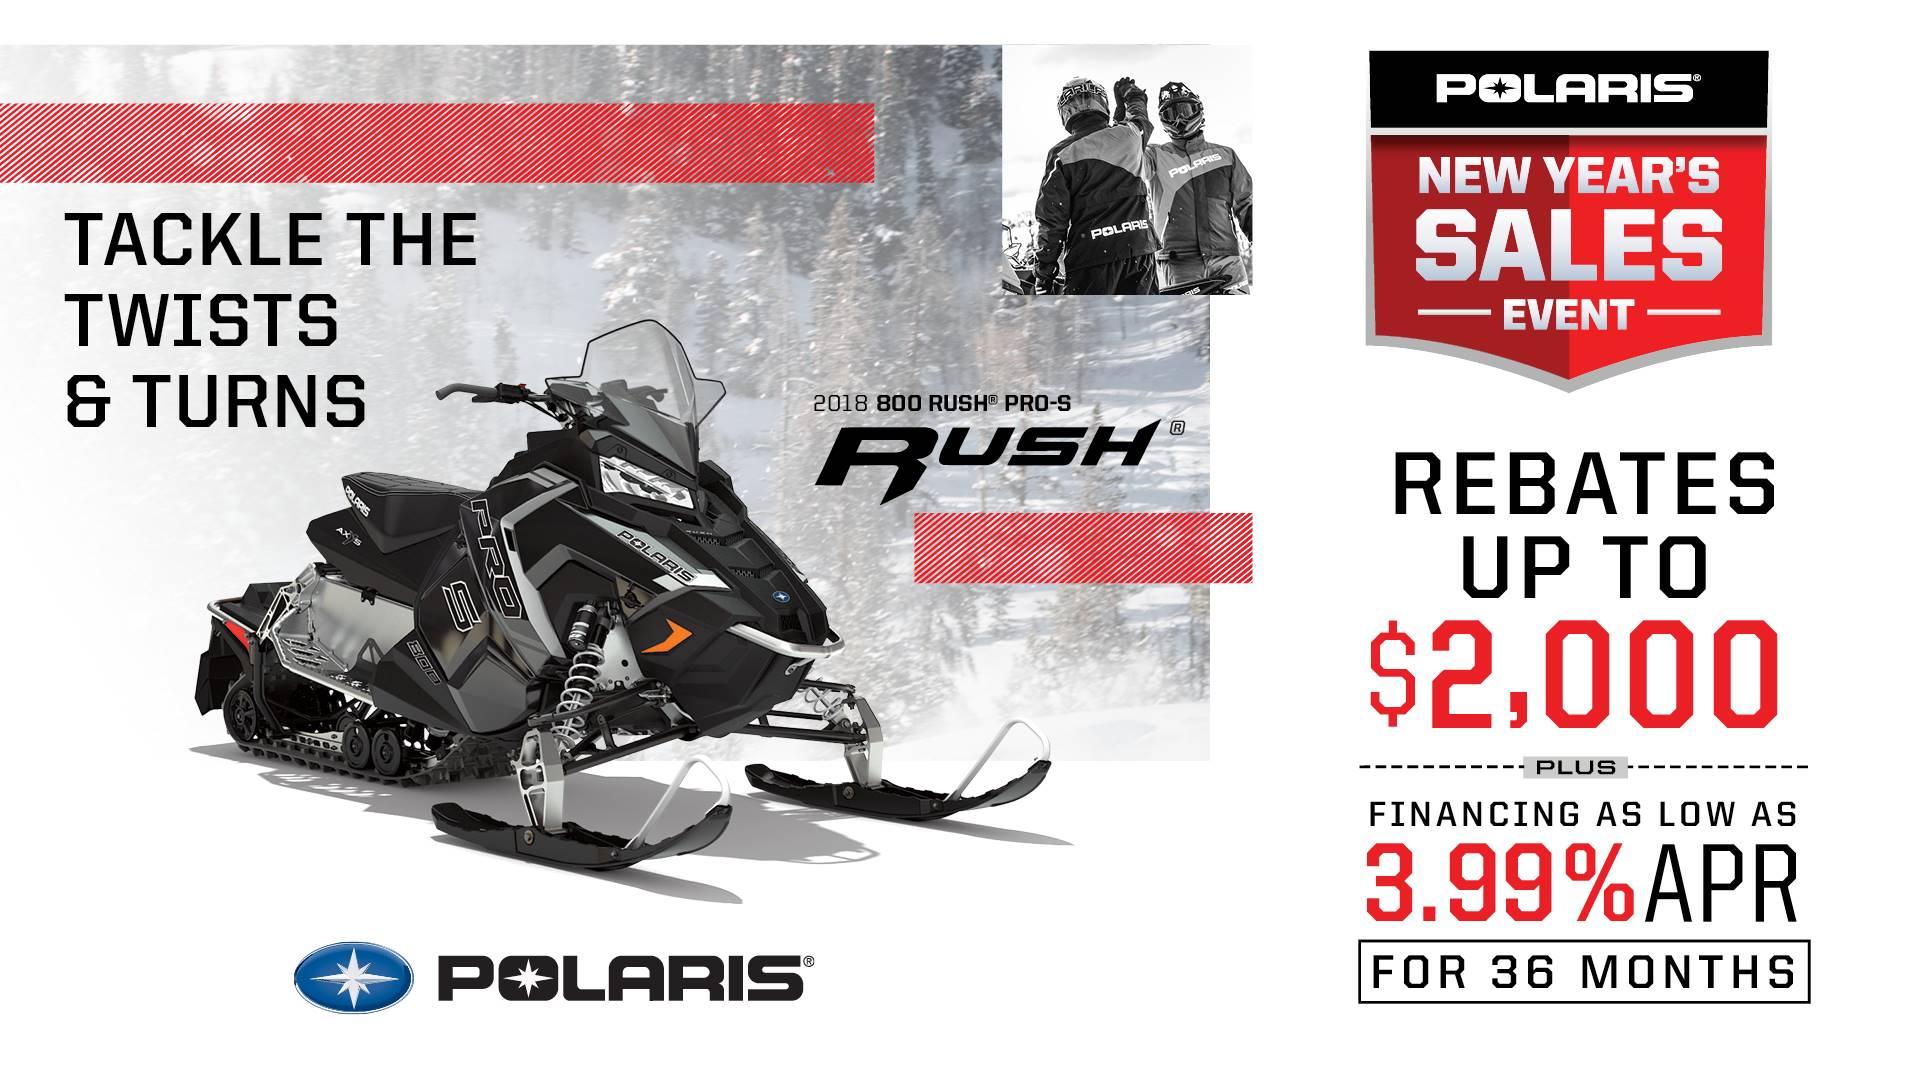 Polaris - New Year's Sales Event - Snowmobiles